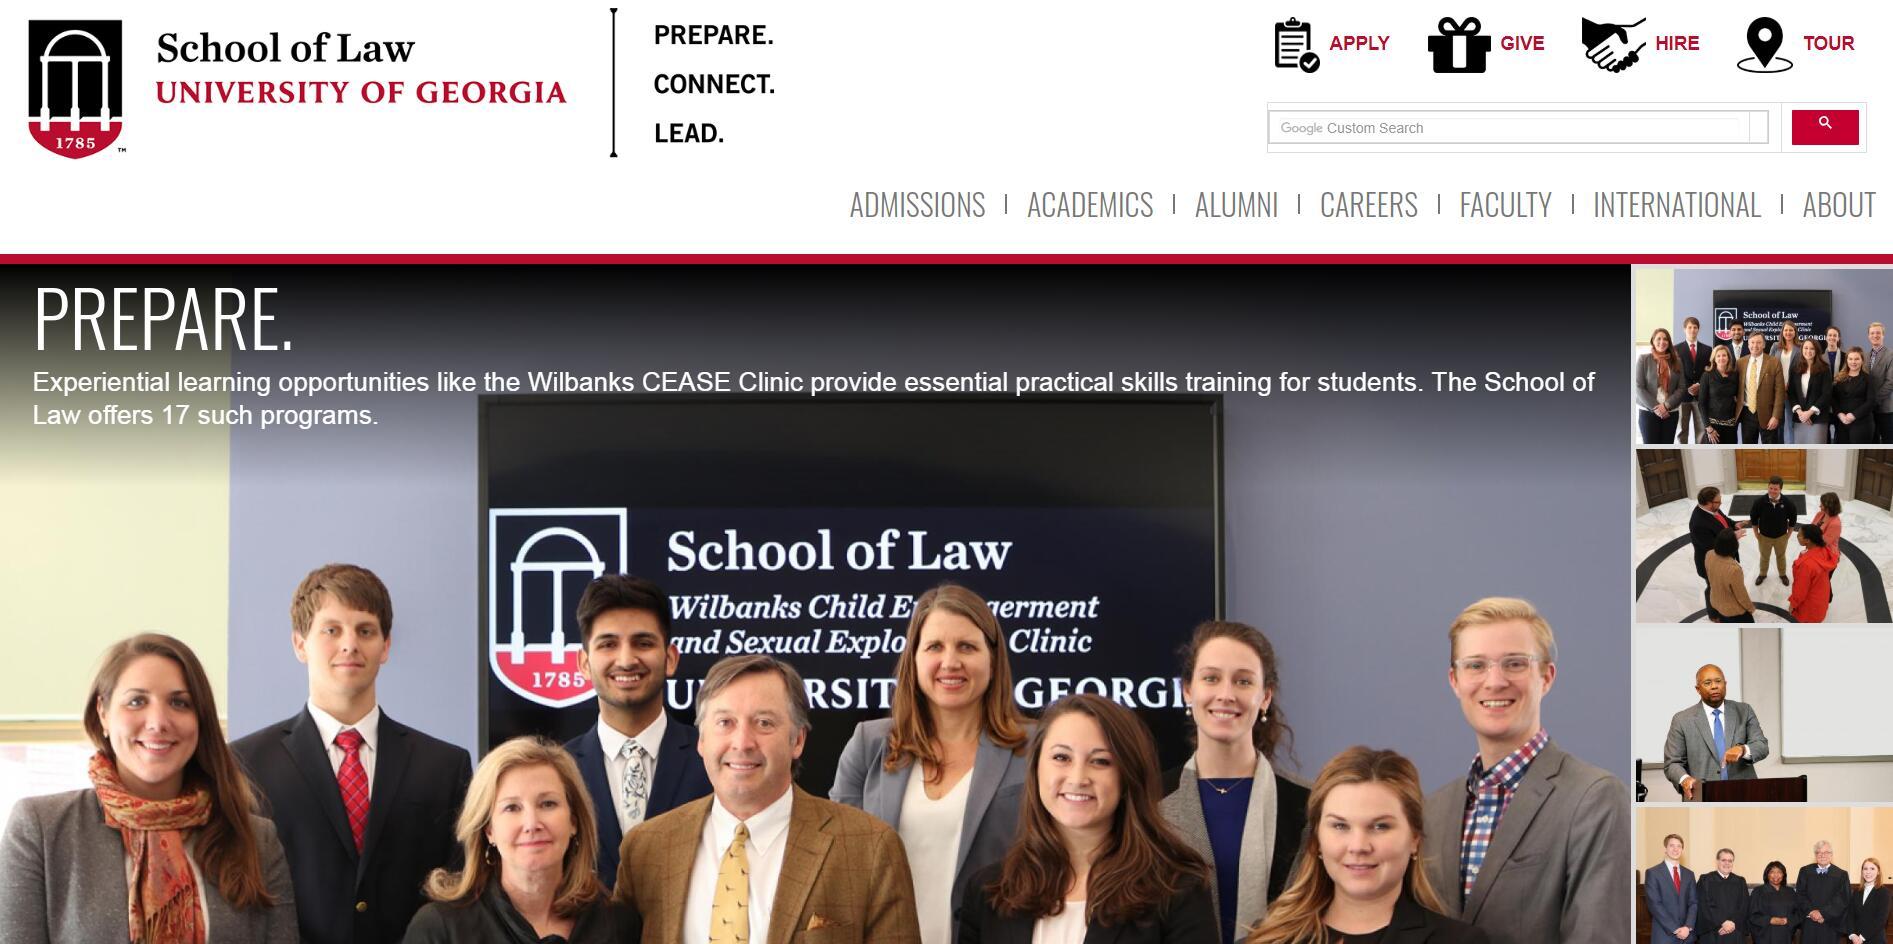 The Law School at University of Georgia